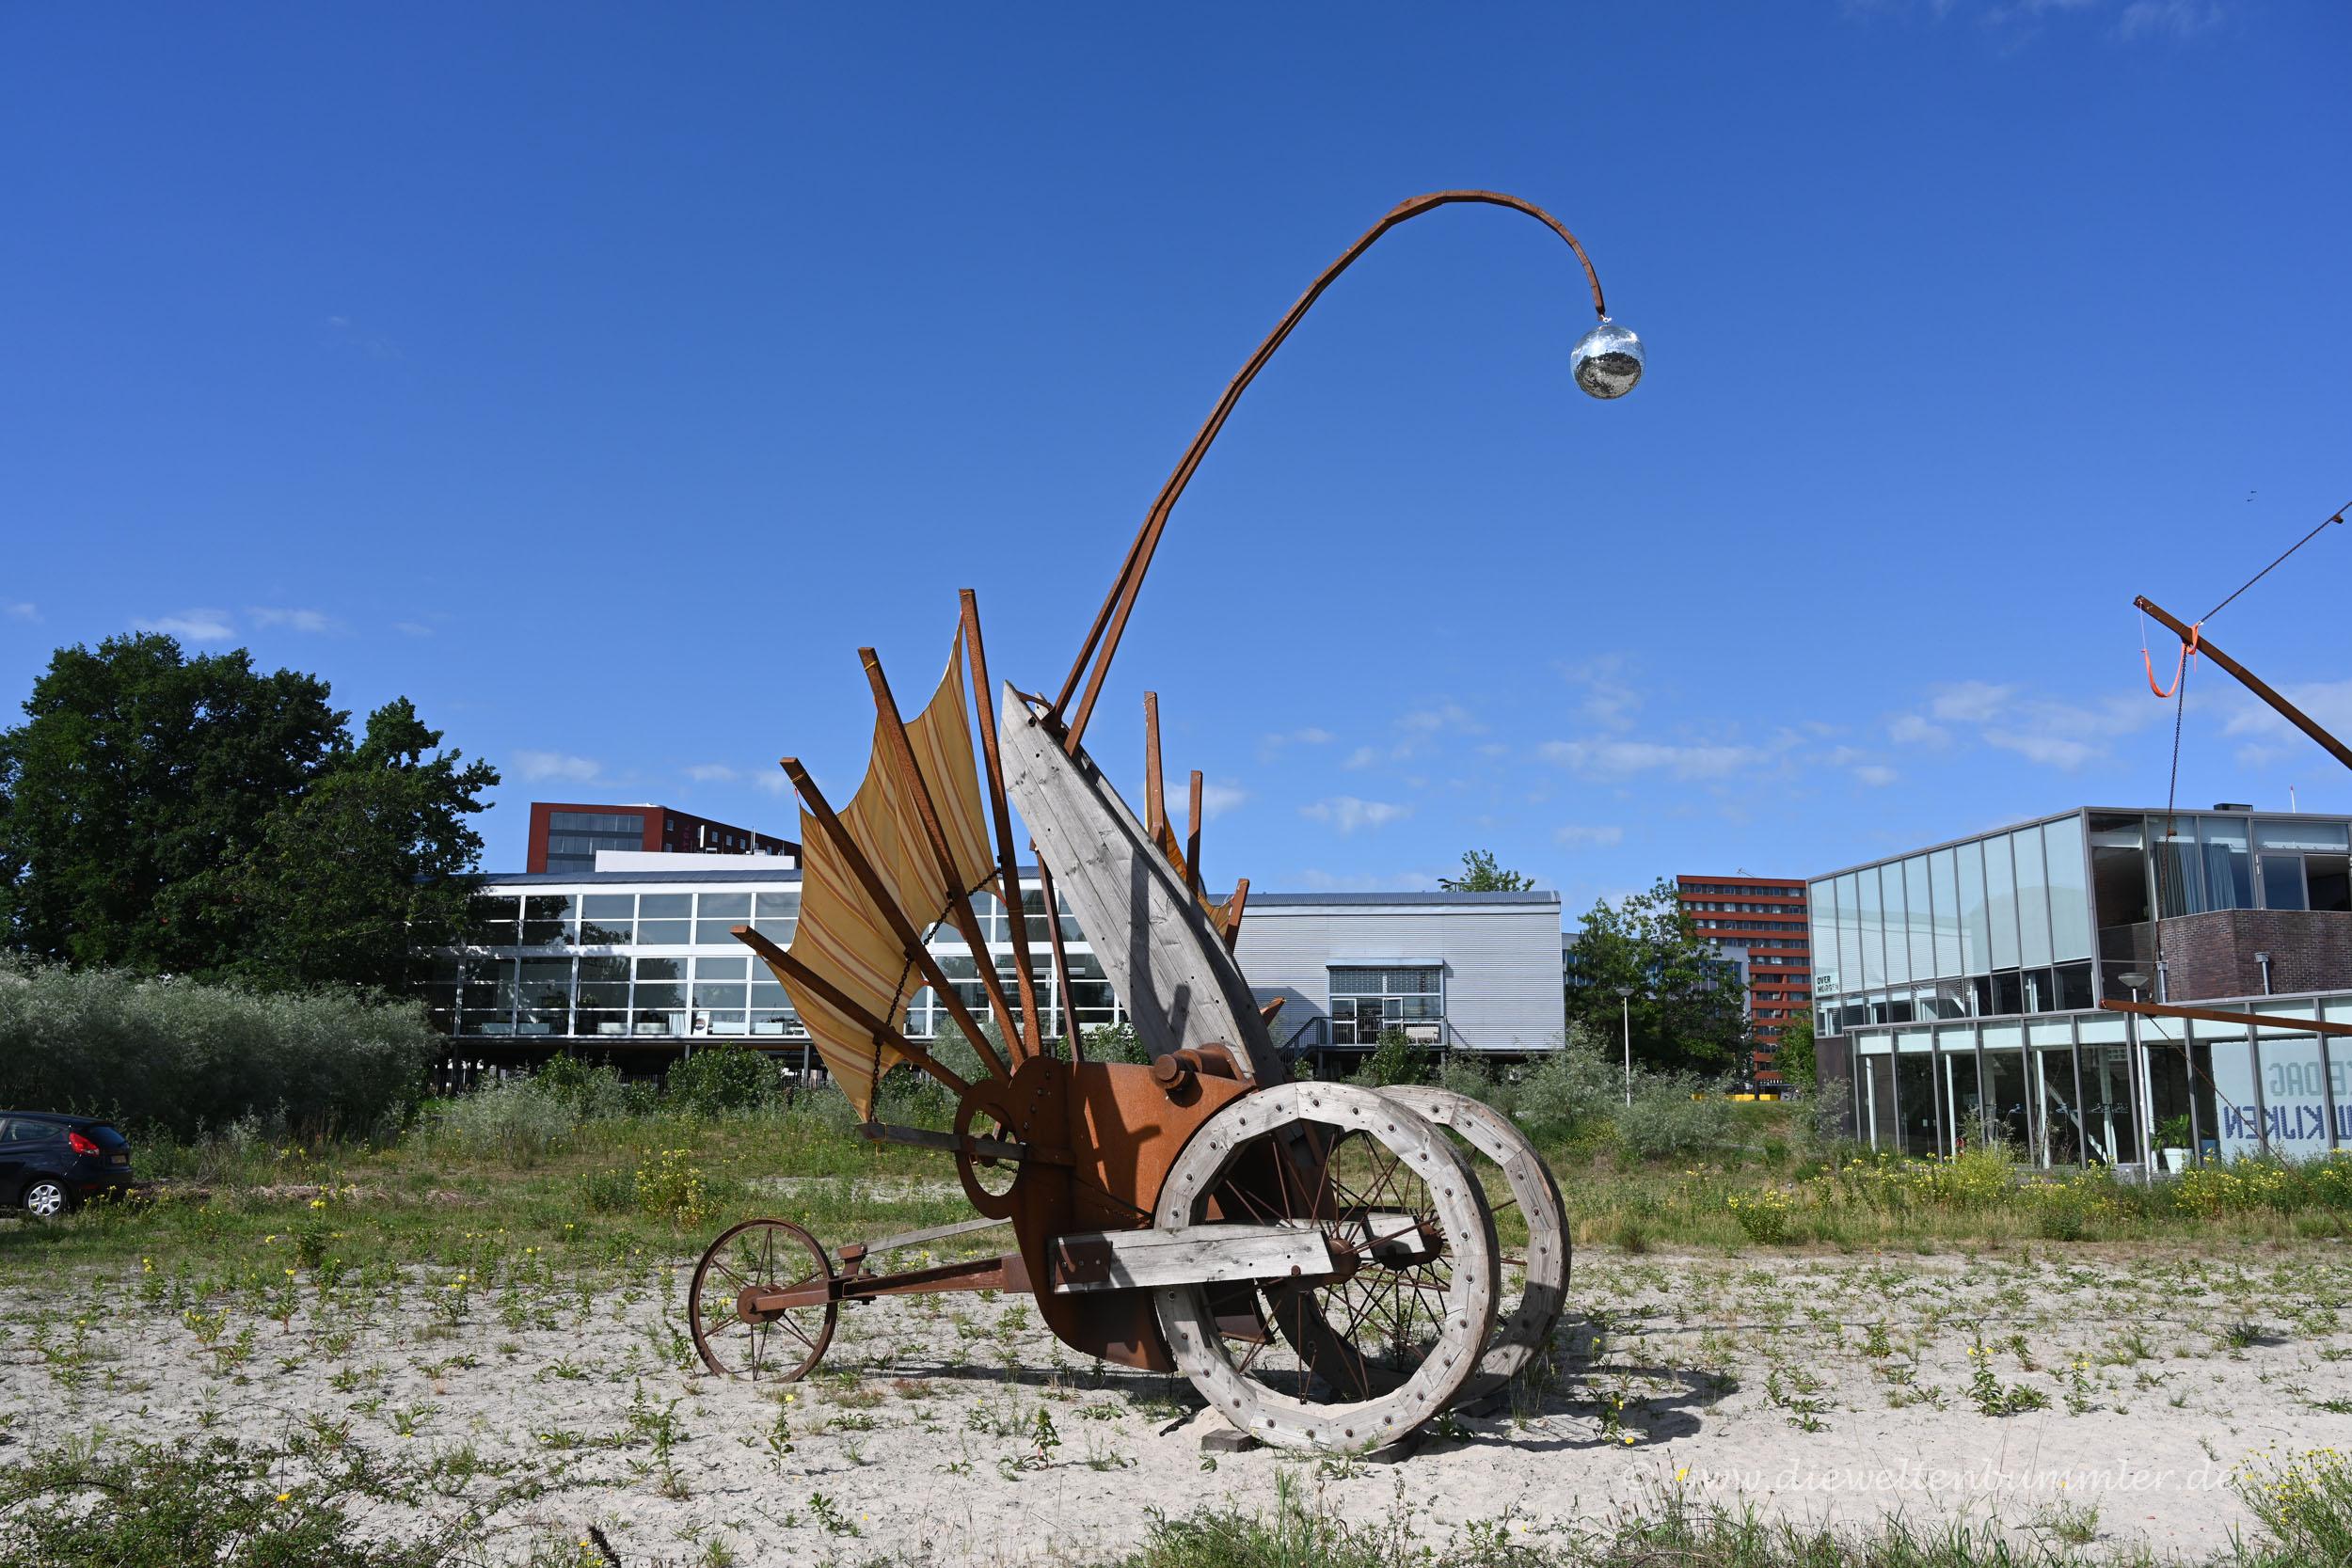 Skulptur in Amersfoort